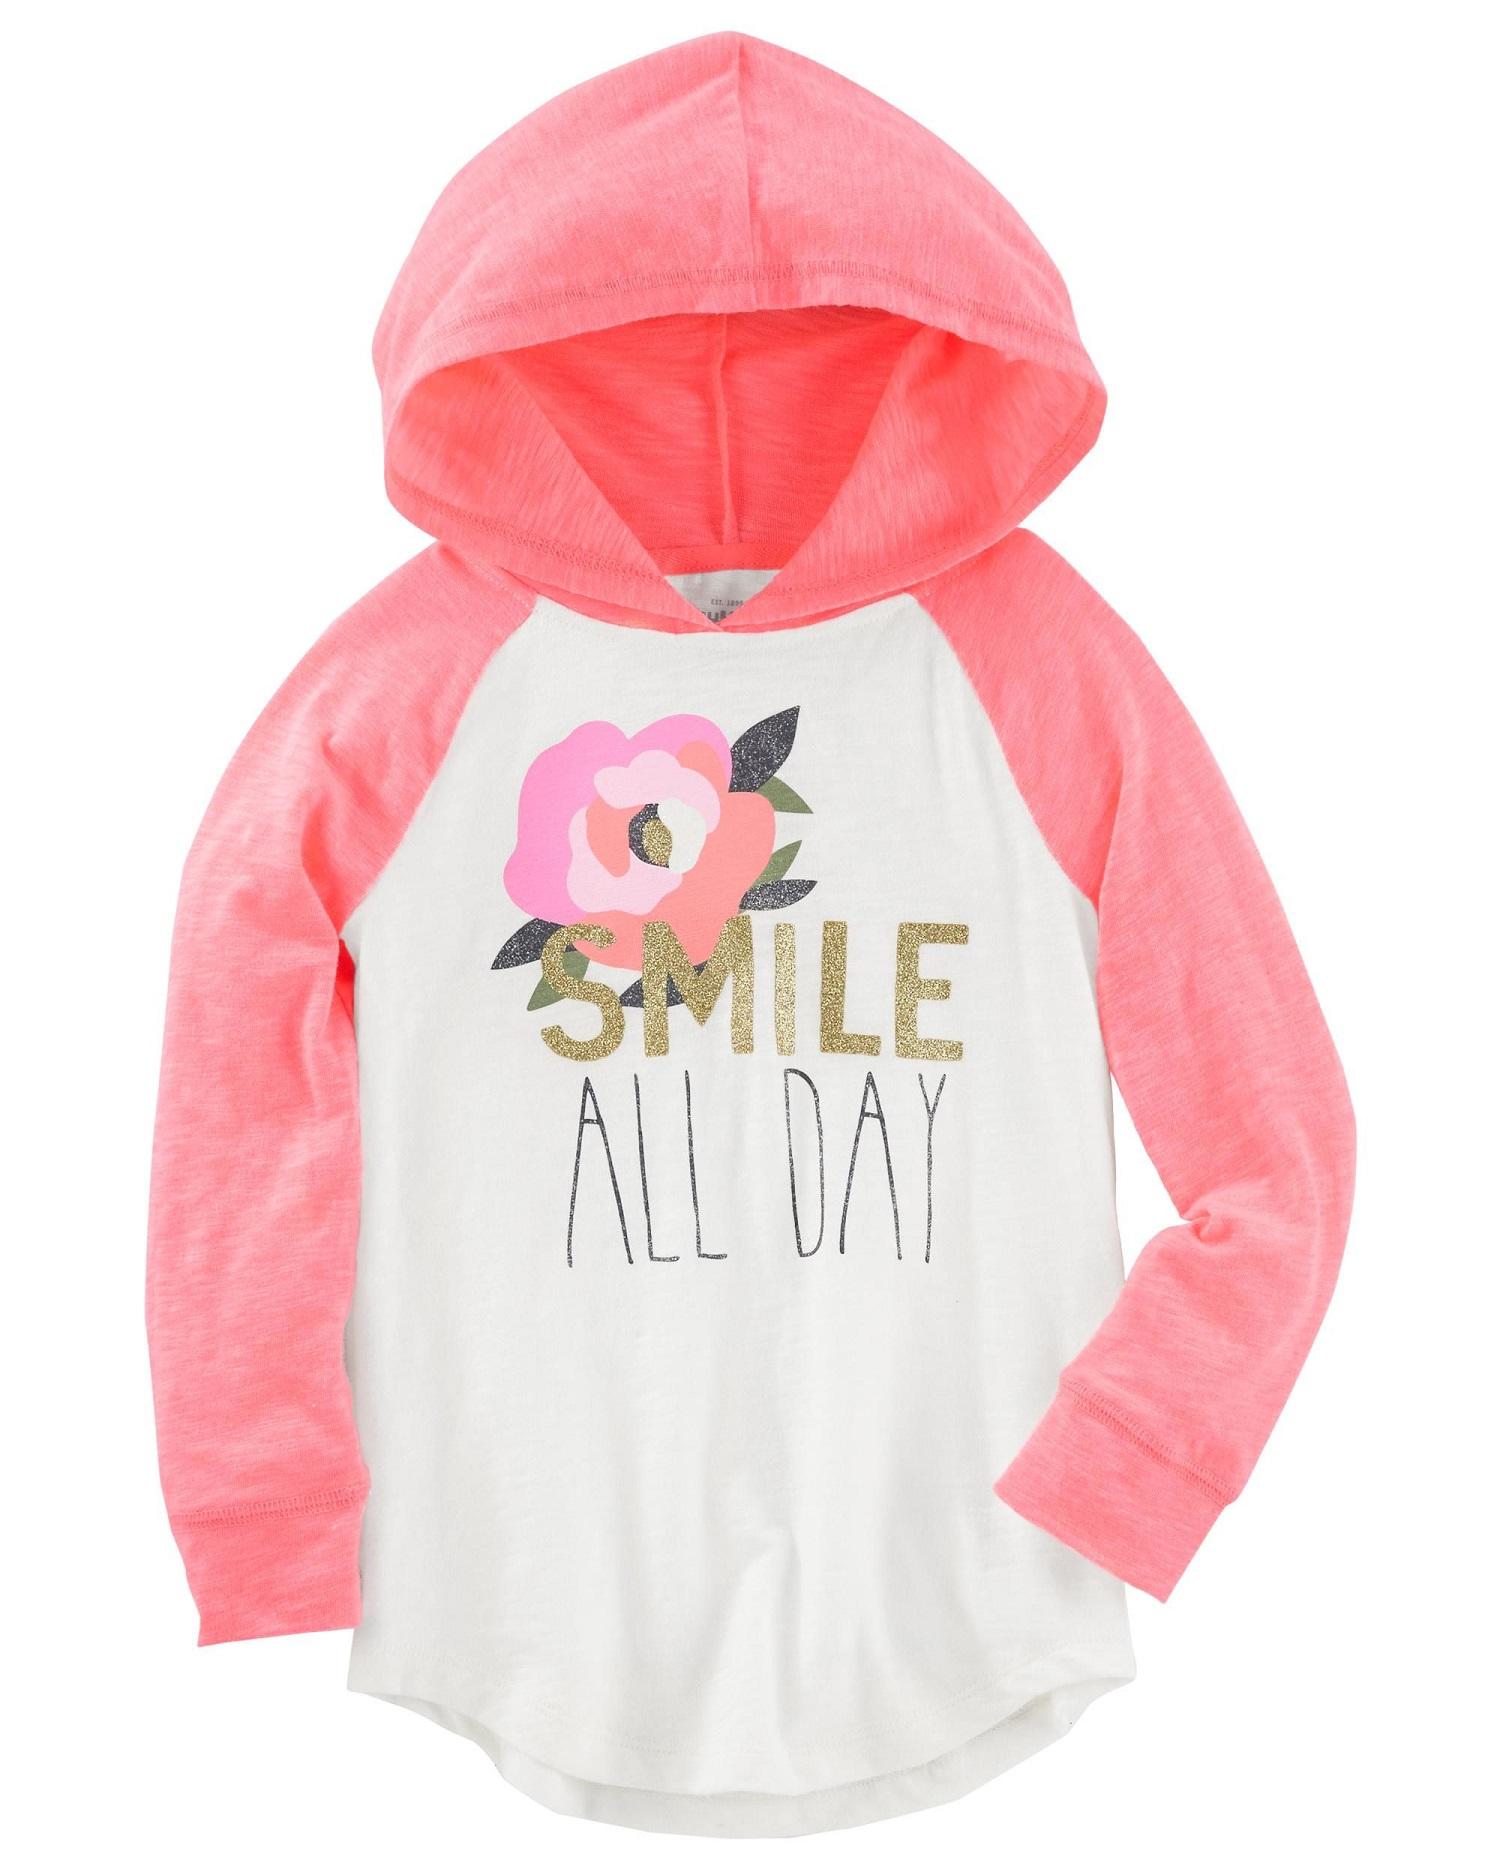 OshKosh B'gosh Little Girls' Glitter Hooded Tunic- Smile All Day